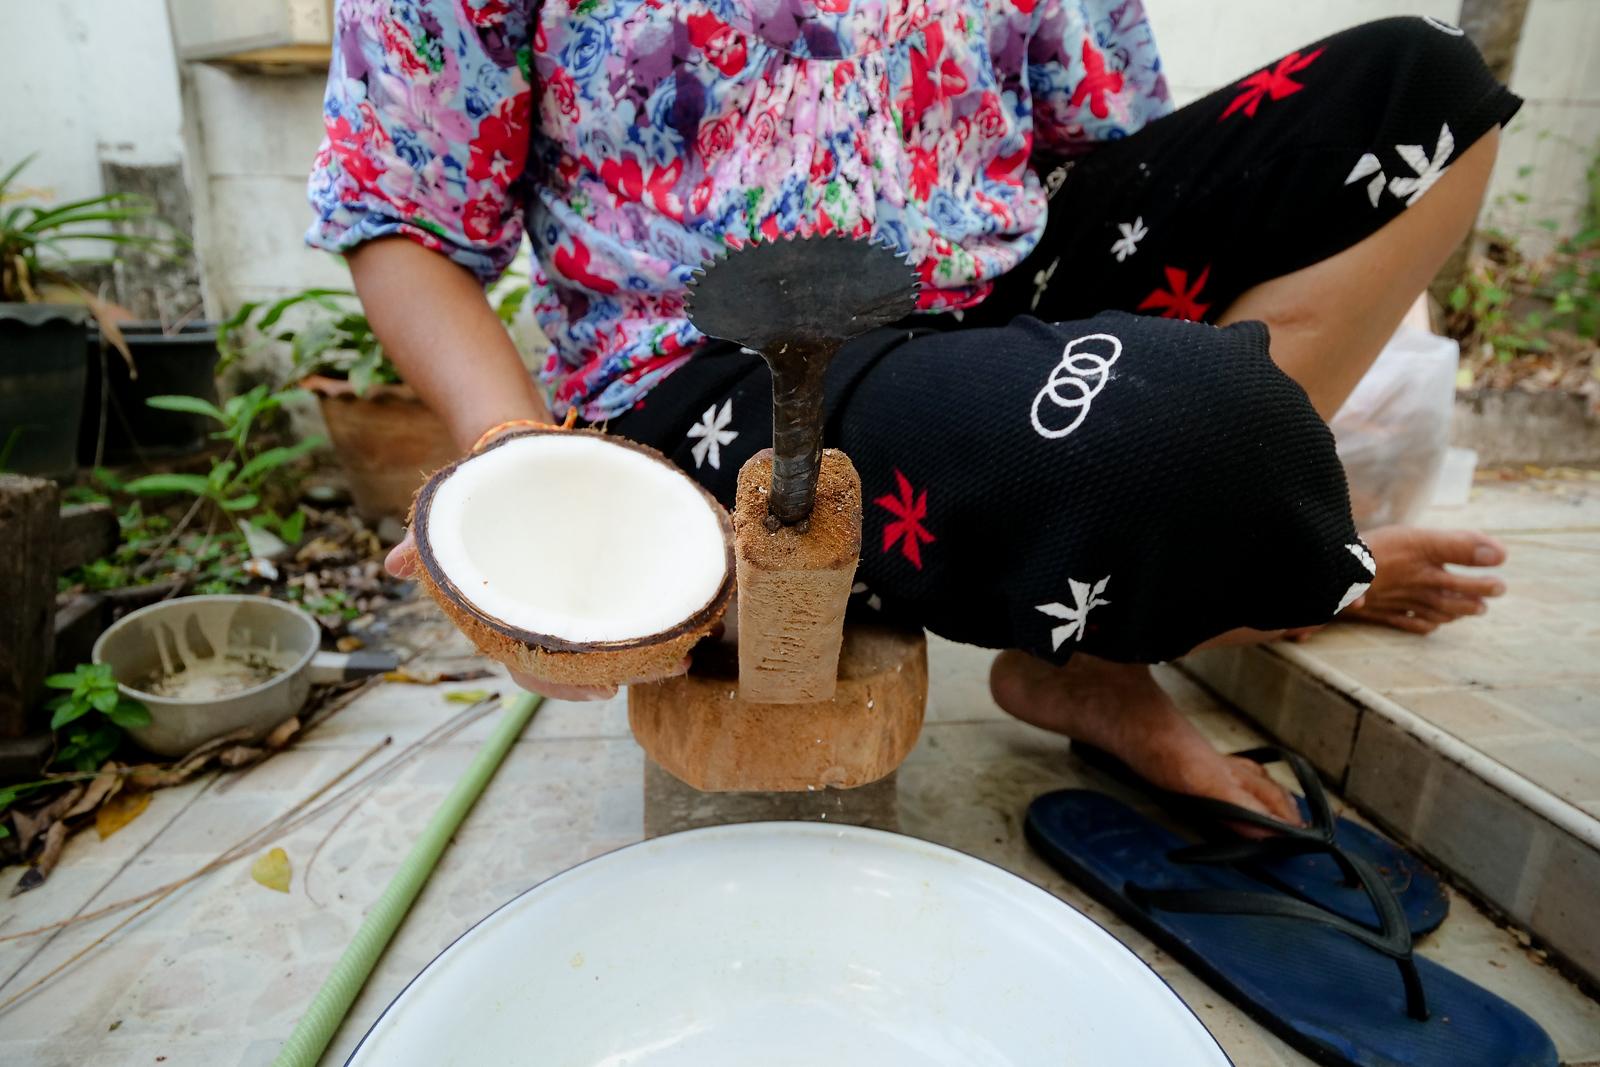 coconut scraper